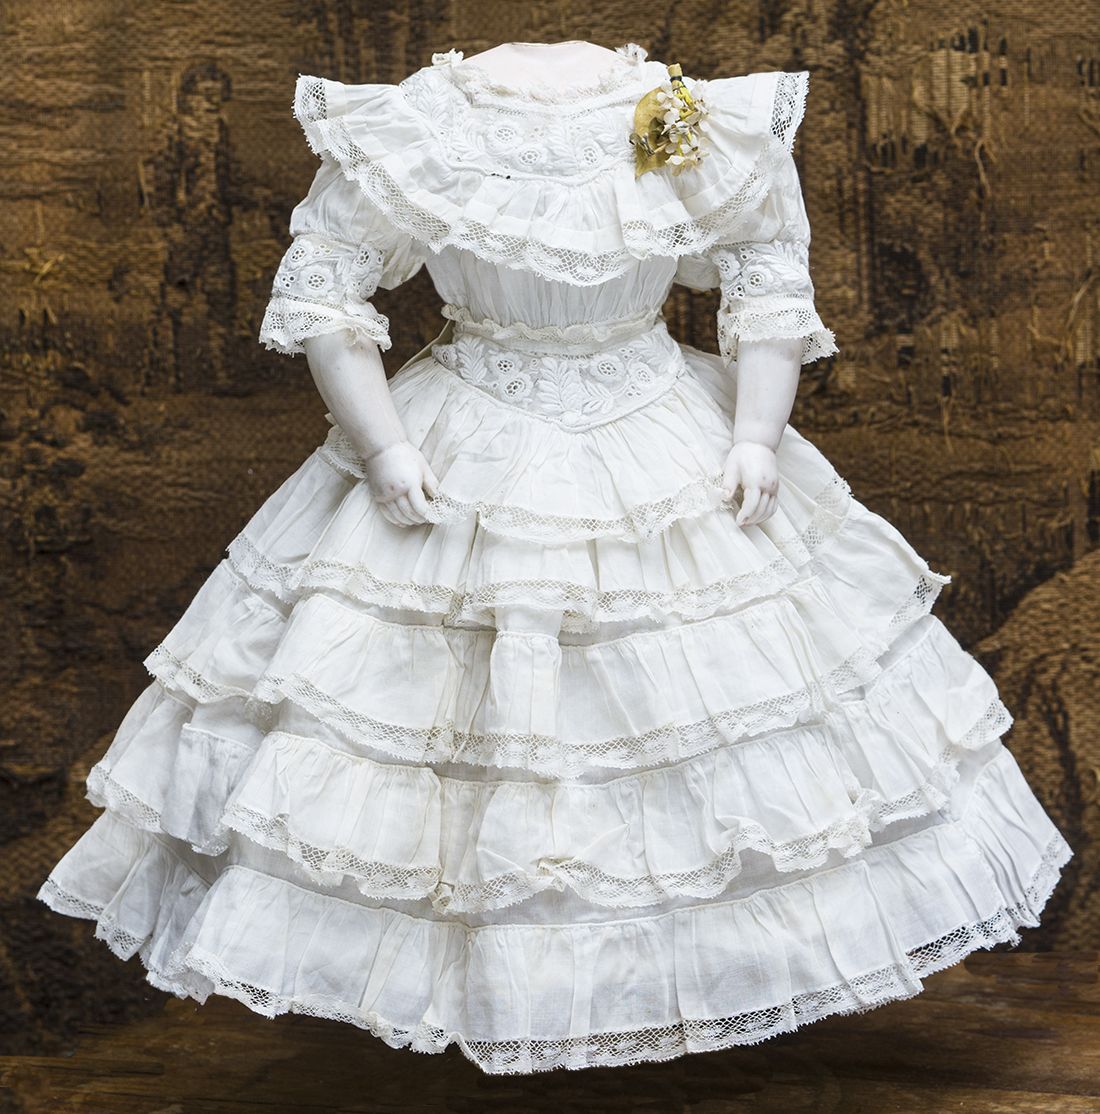 Antique dioll dress